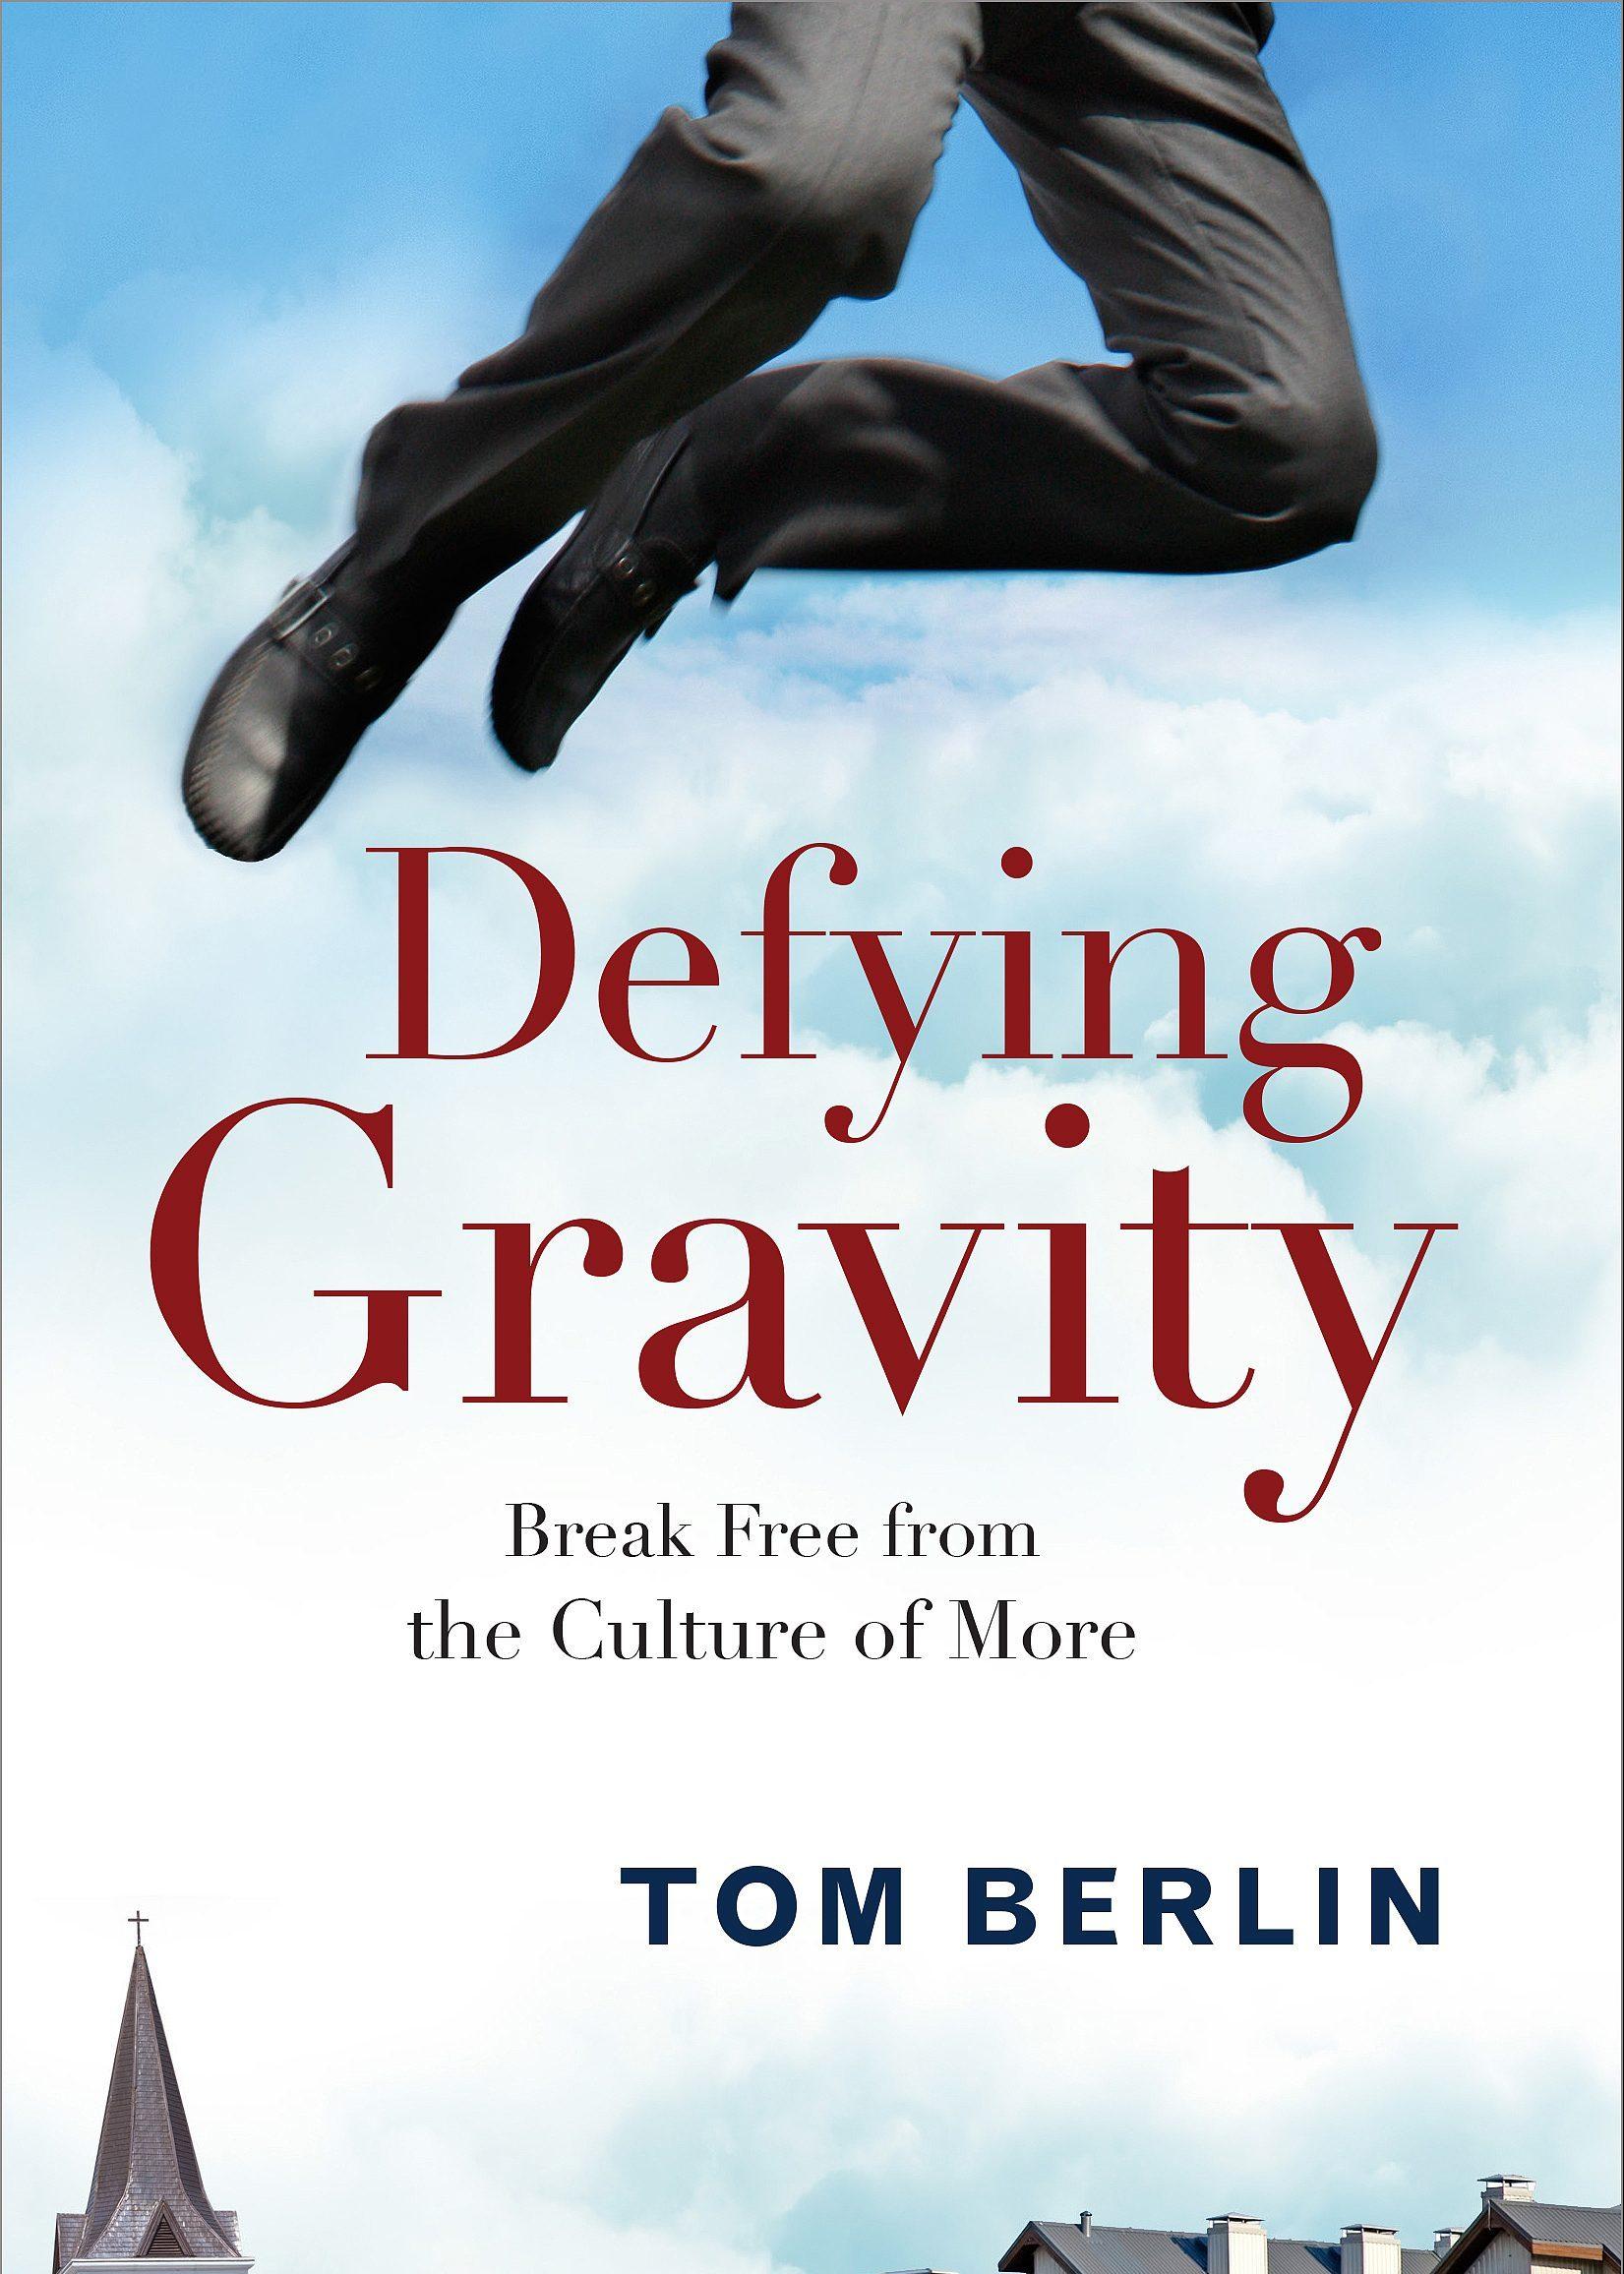 DefyingGravity_9781501813405